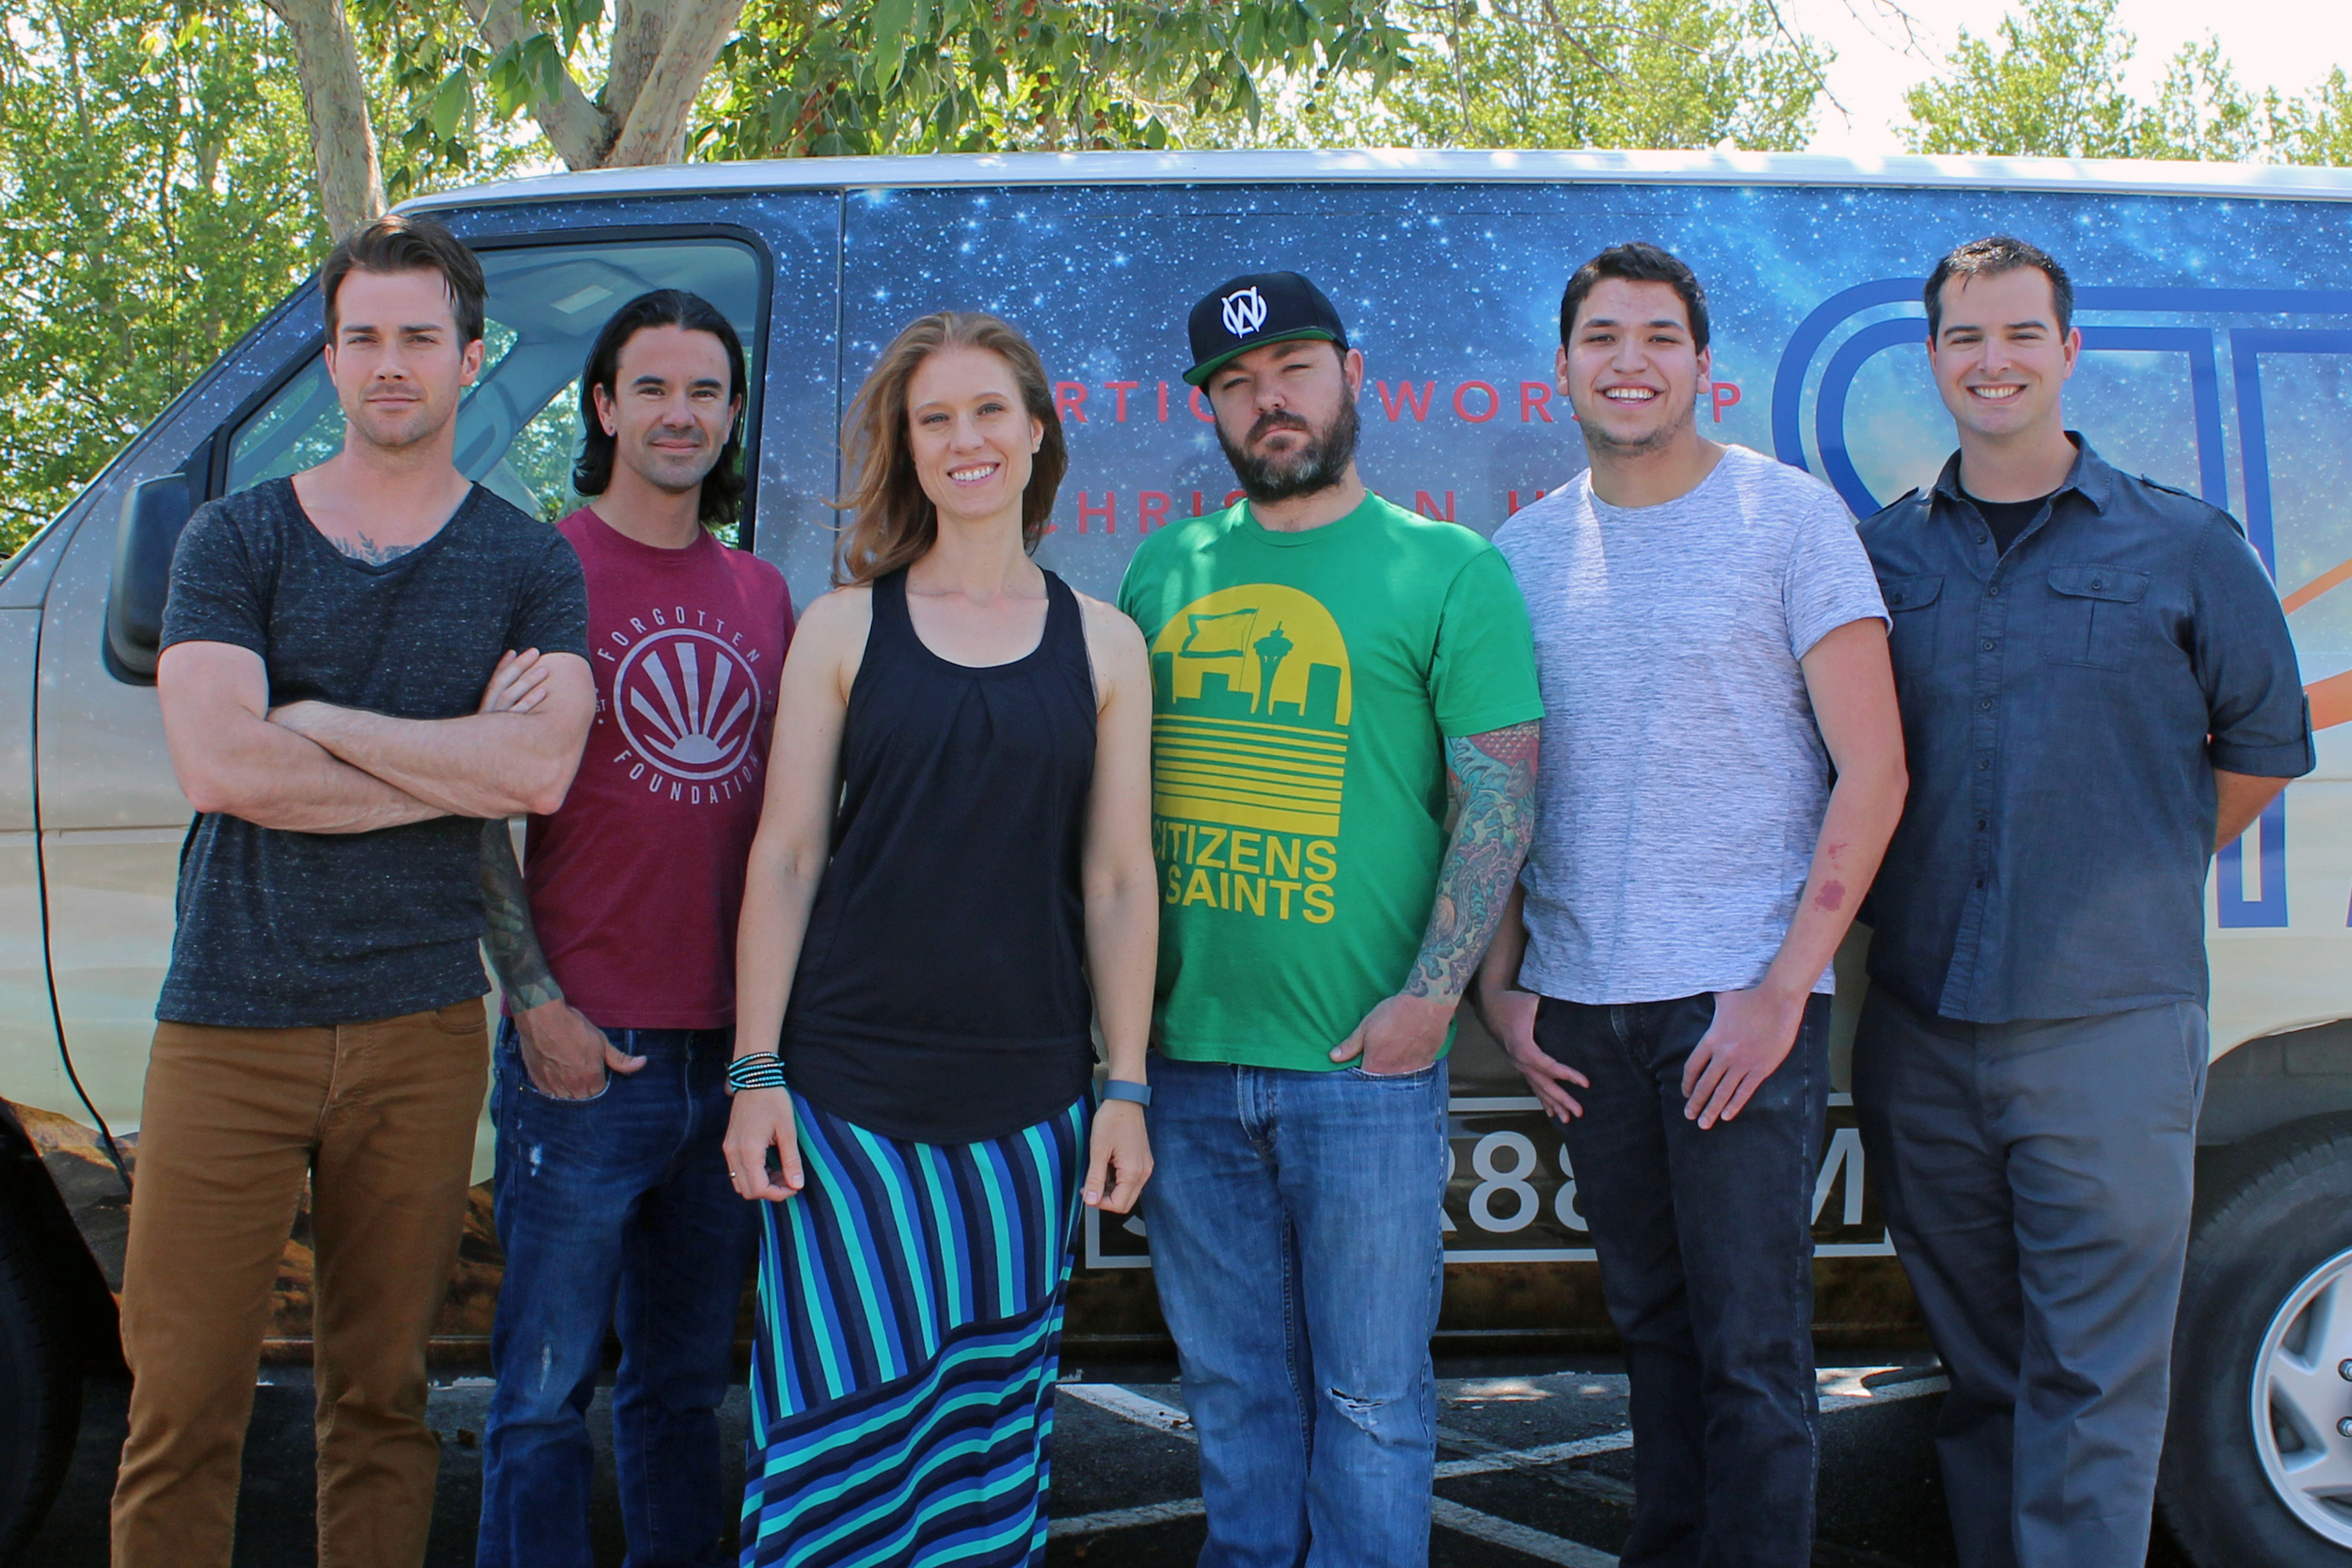 The Star 88 gang Left to Right: Teo, Stevo, me, Dex, Mahoots, Daniel